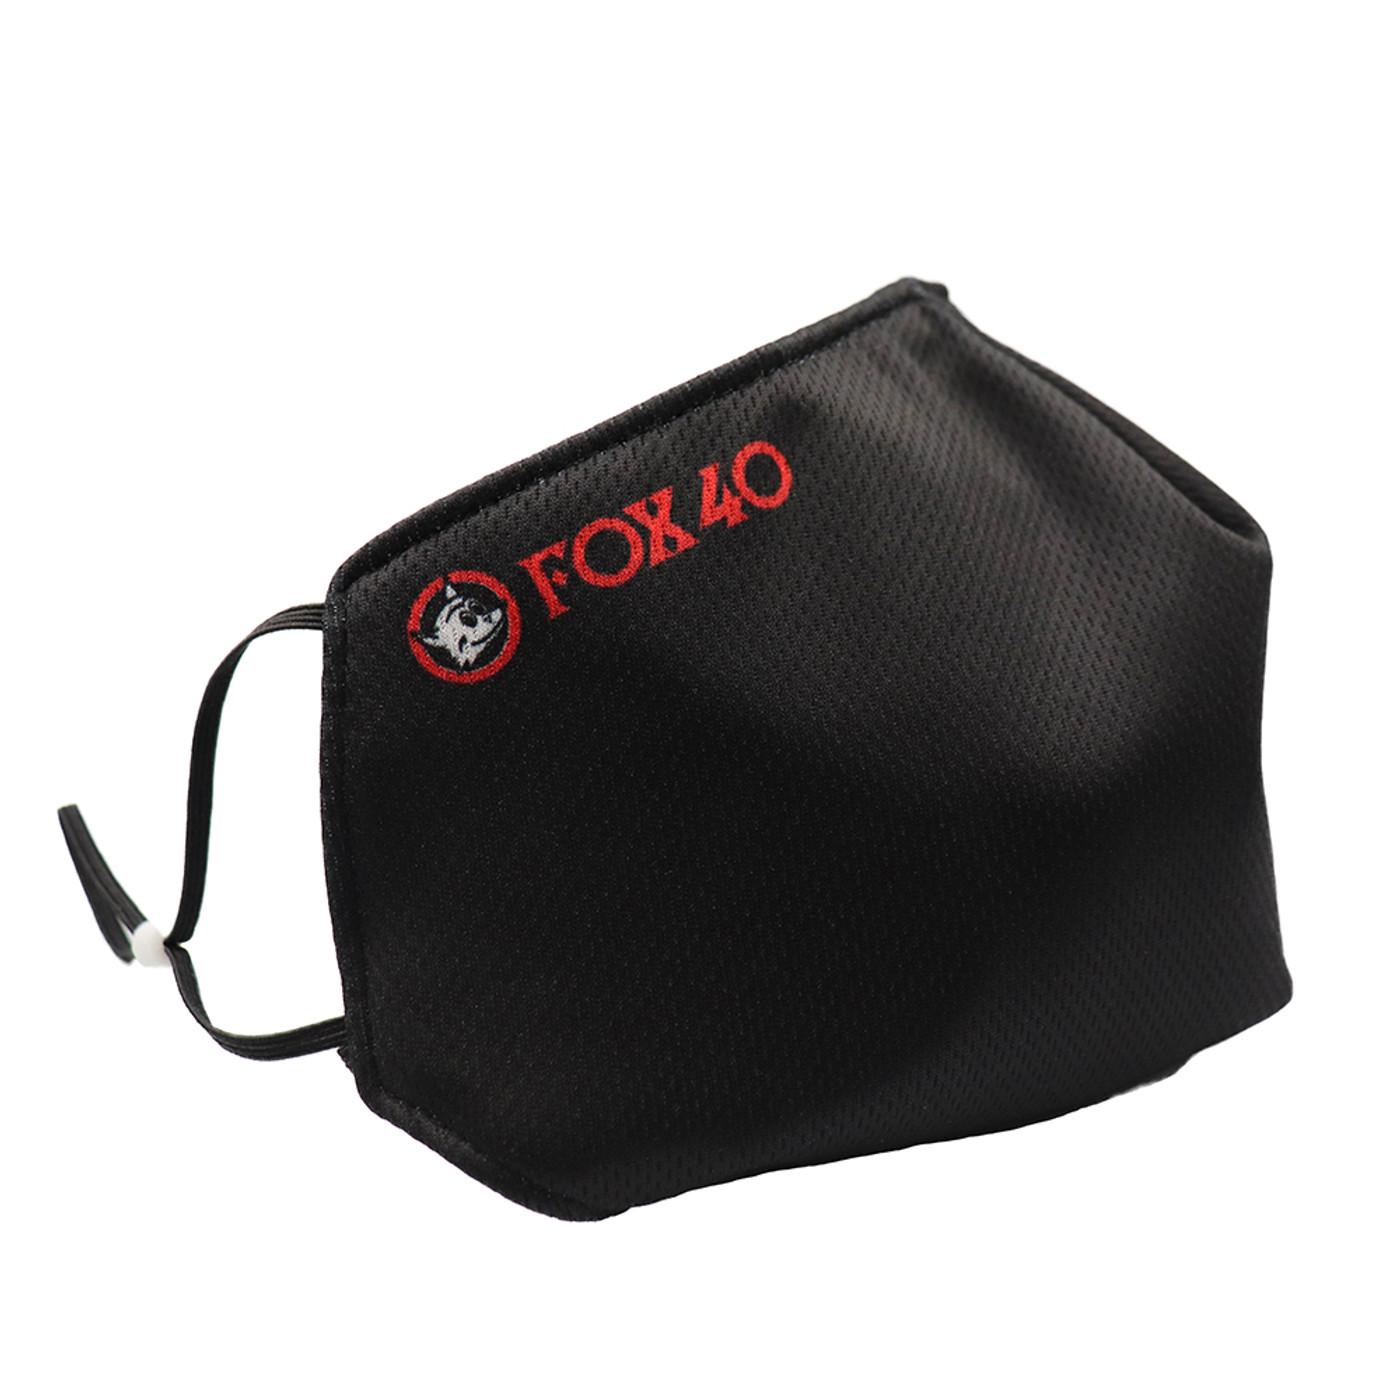 7066 Fox 40 Whistle Mask